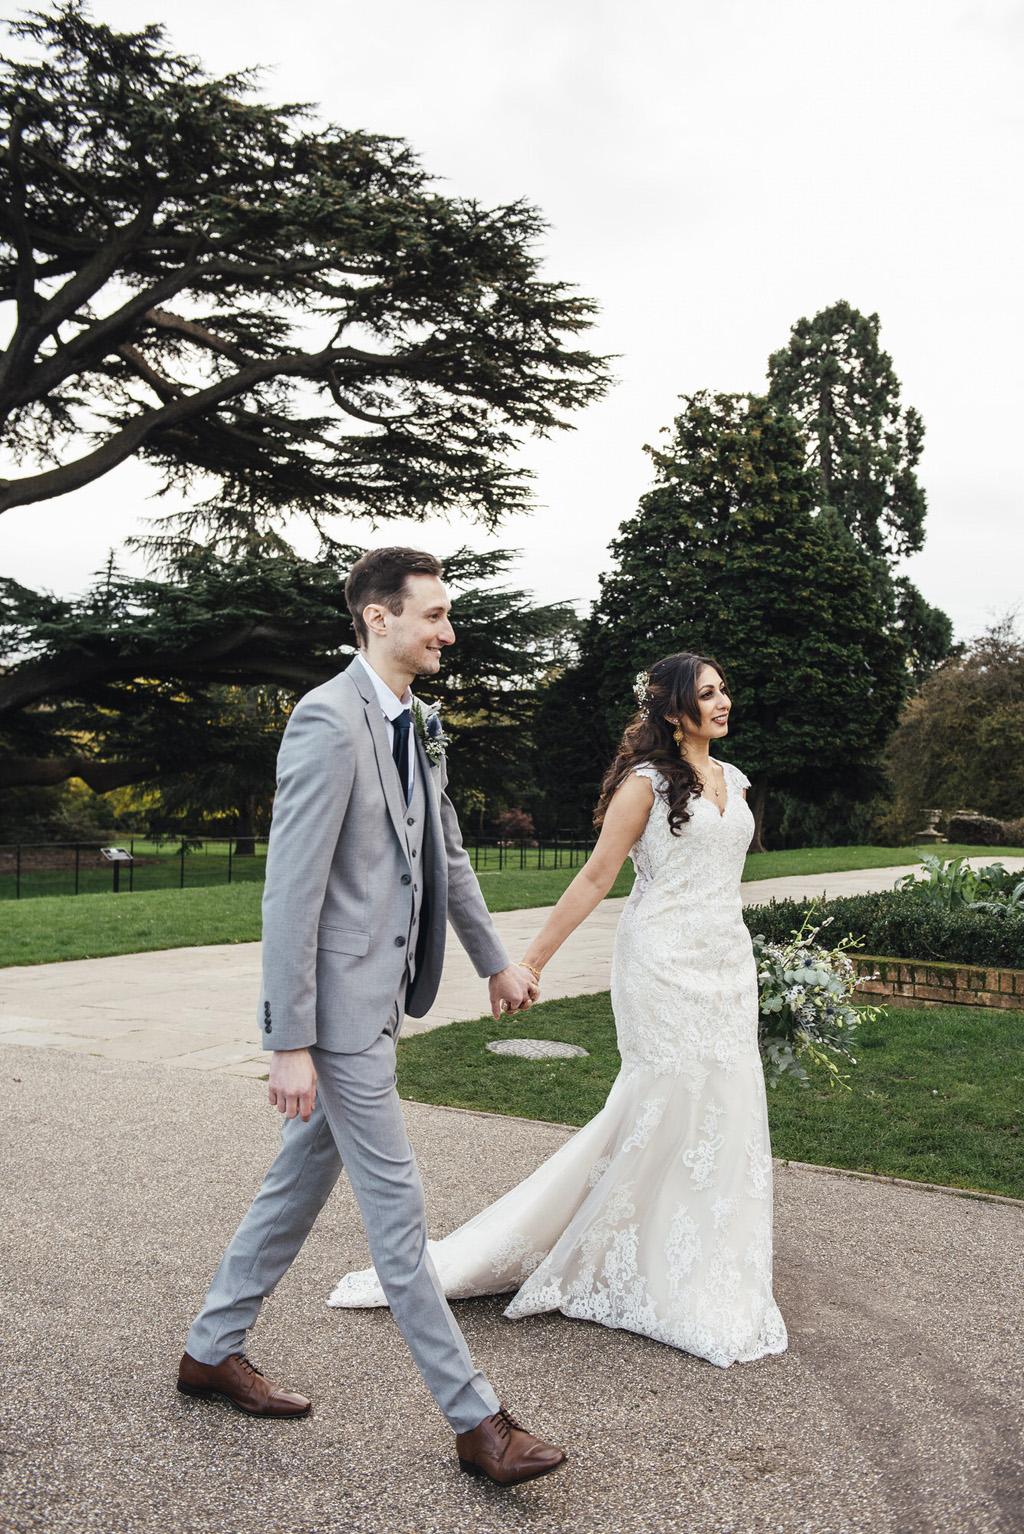 documentary wedding photography by Jessica Grace UK